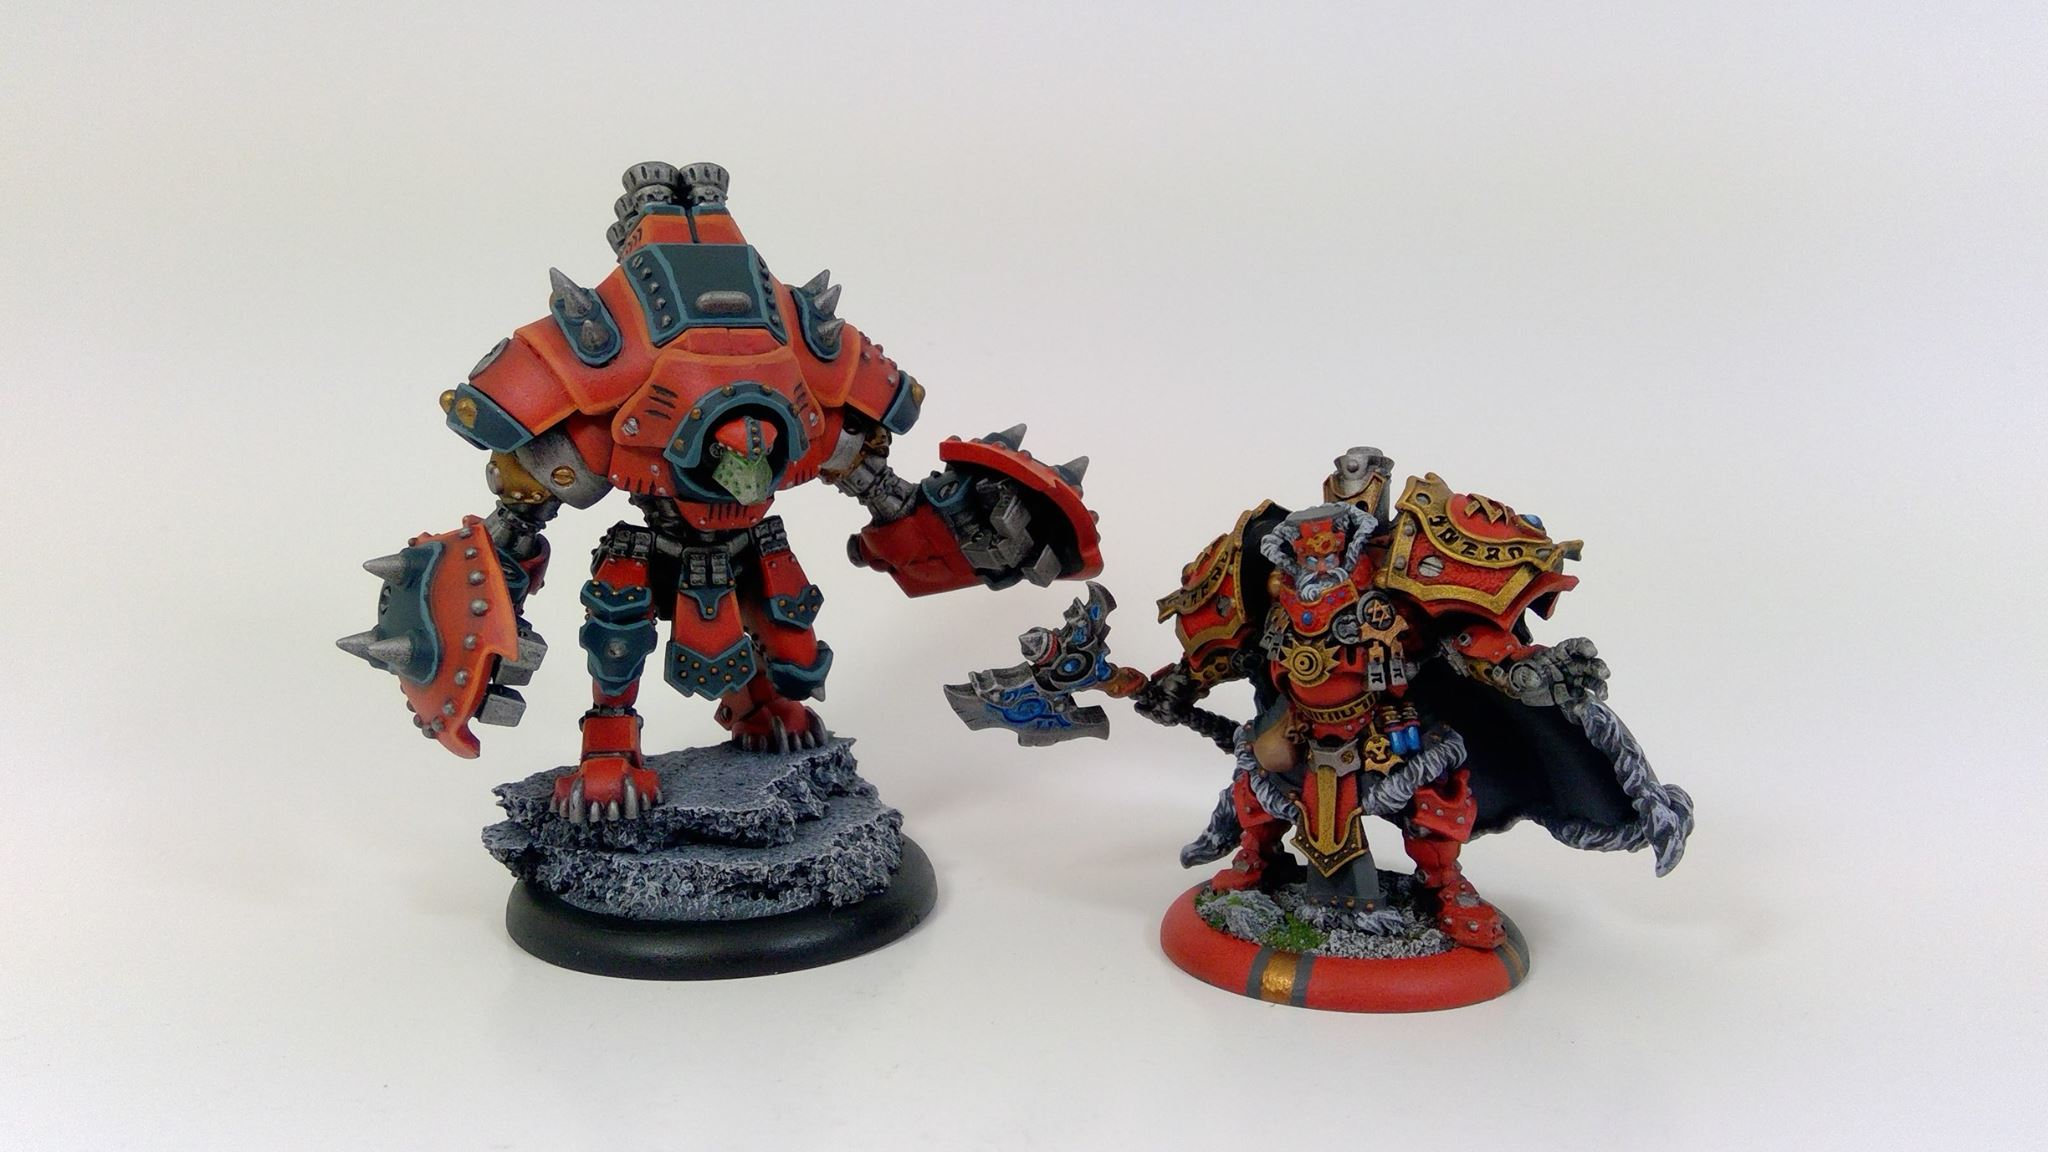 Forge-seer & His Kodiak